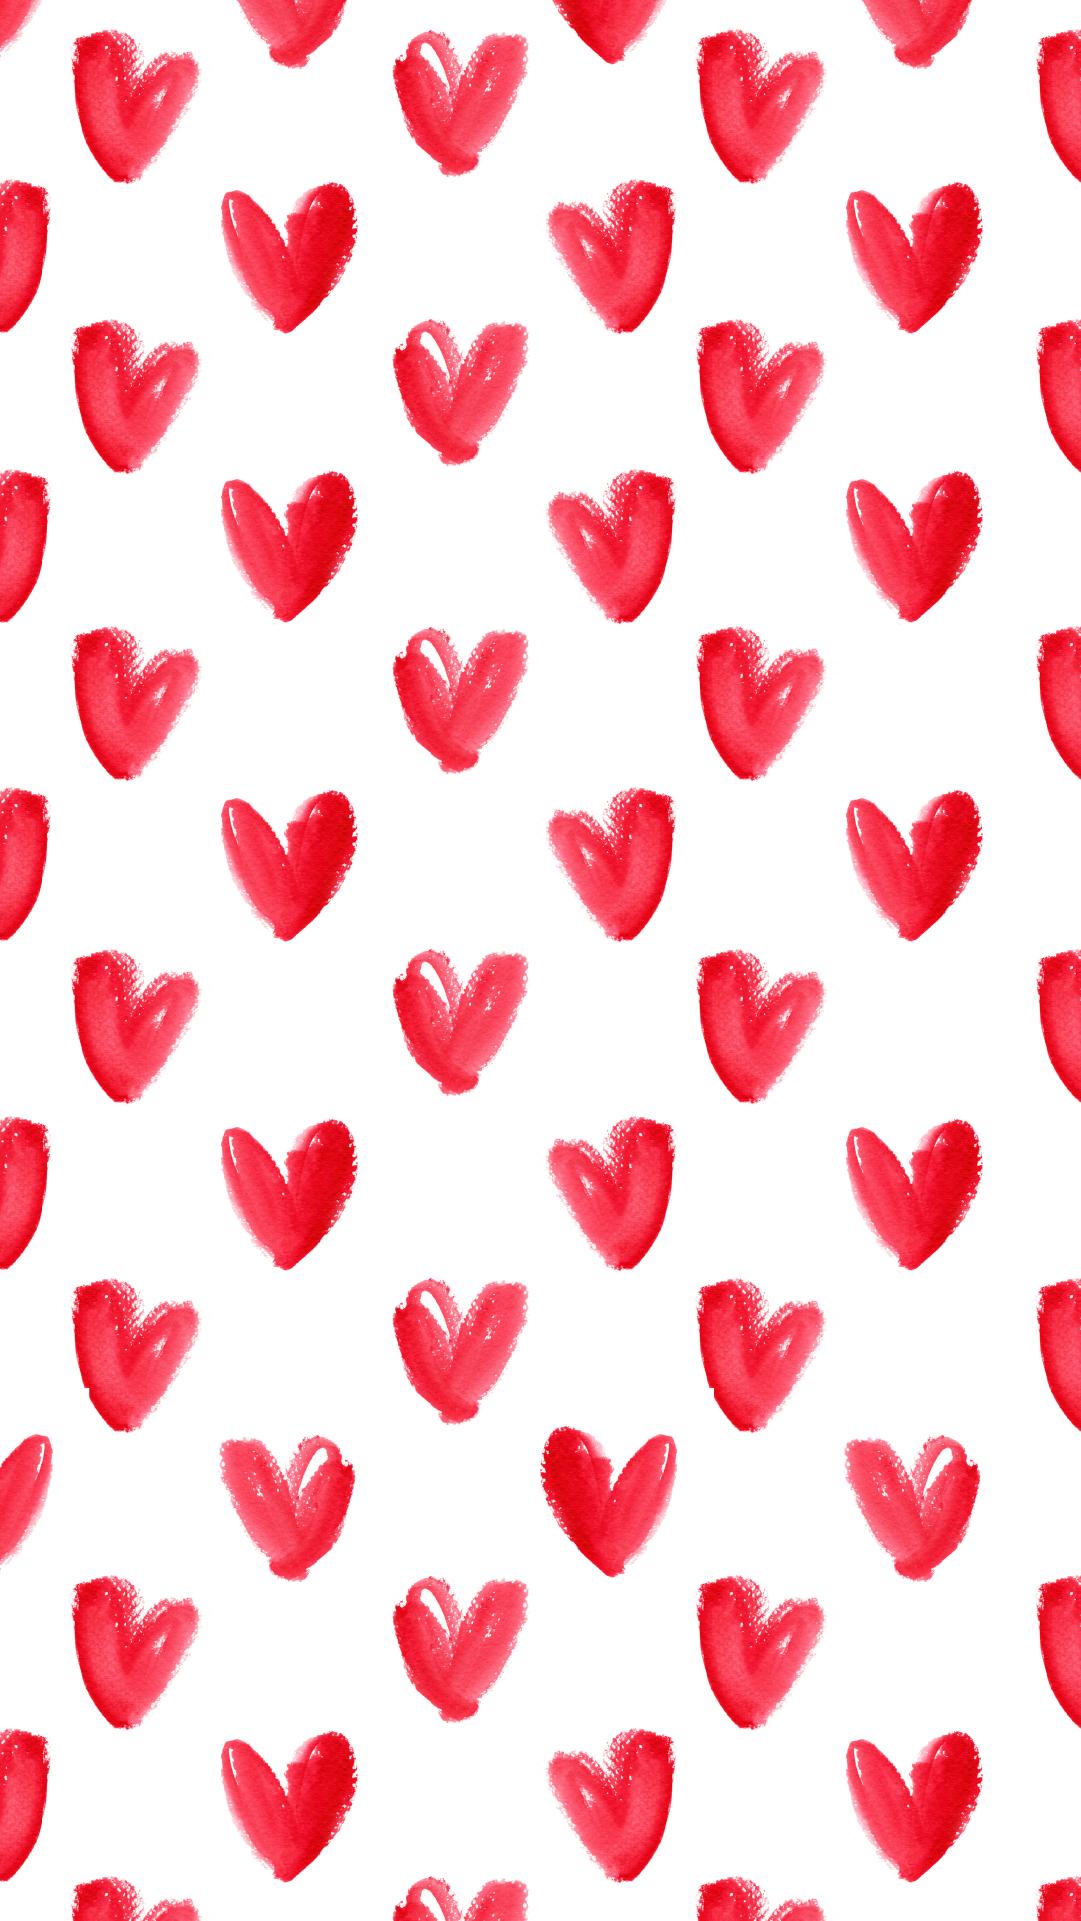 February-iPhone-Nicolesclasses-png-%C3%97-pixels-wallpaper-wp5805610